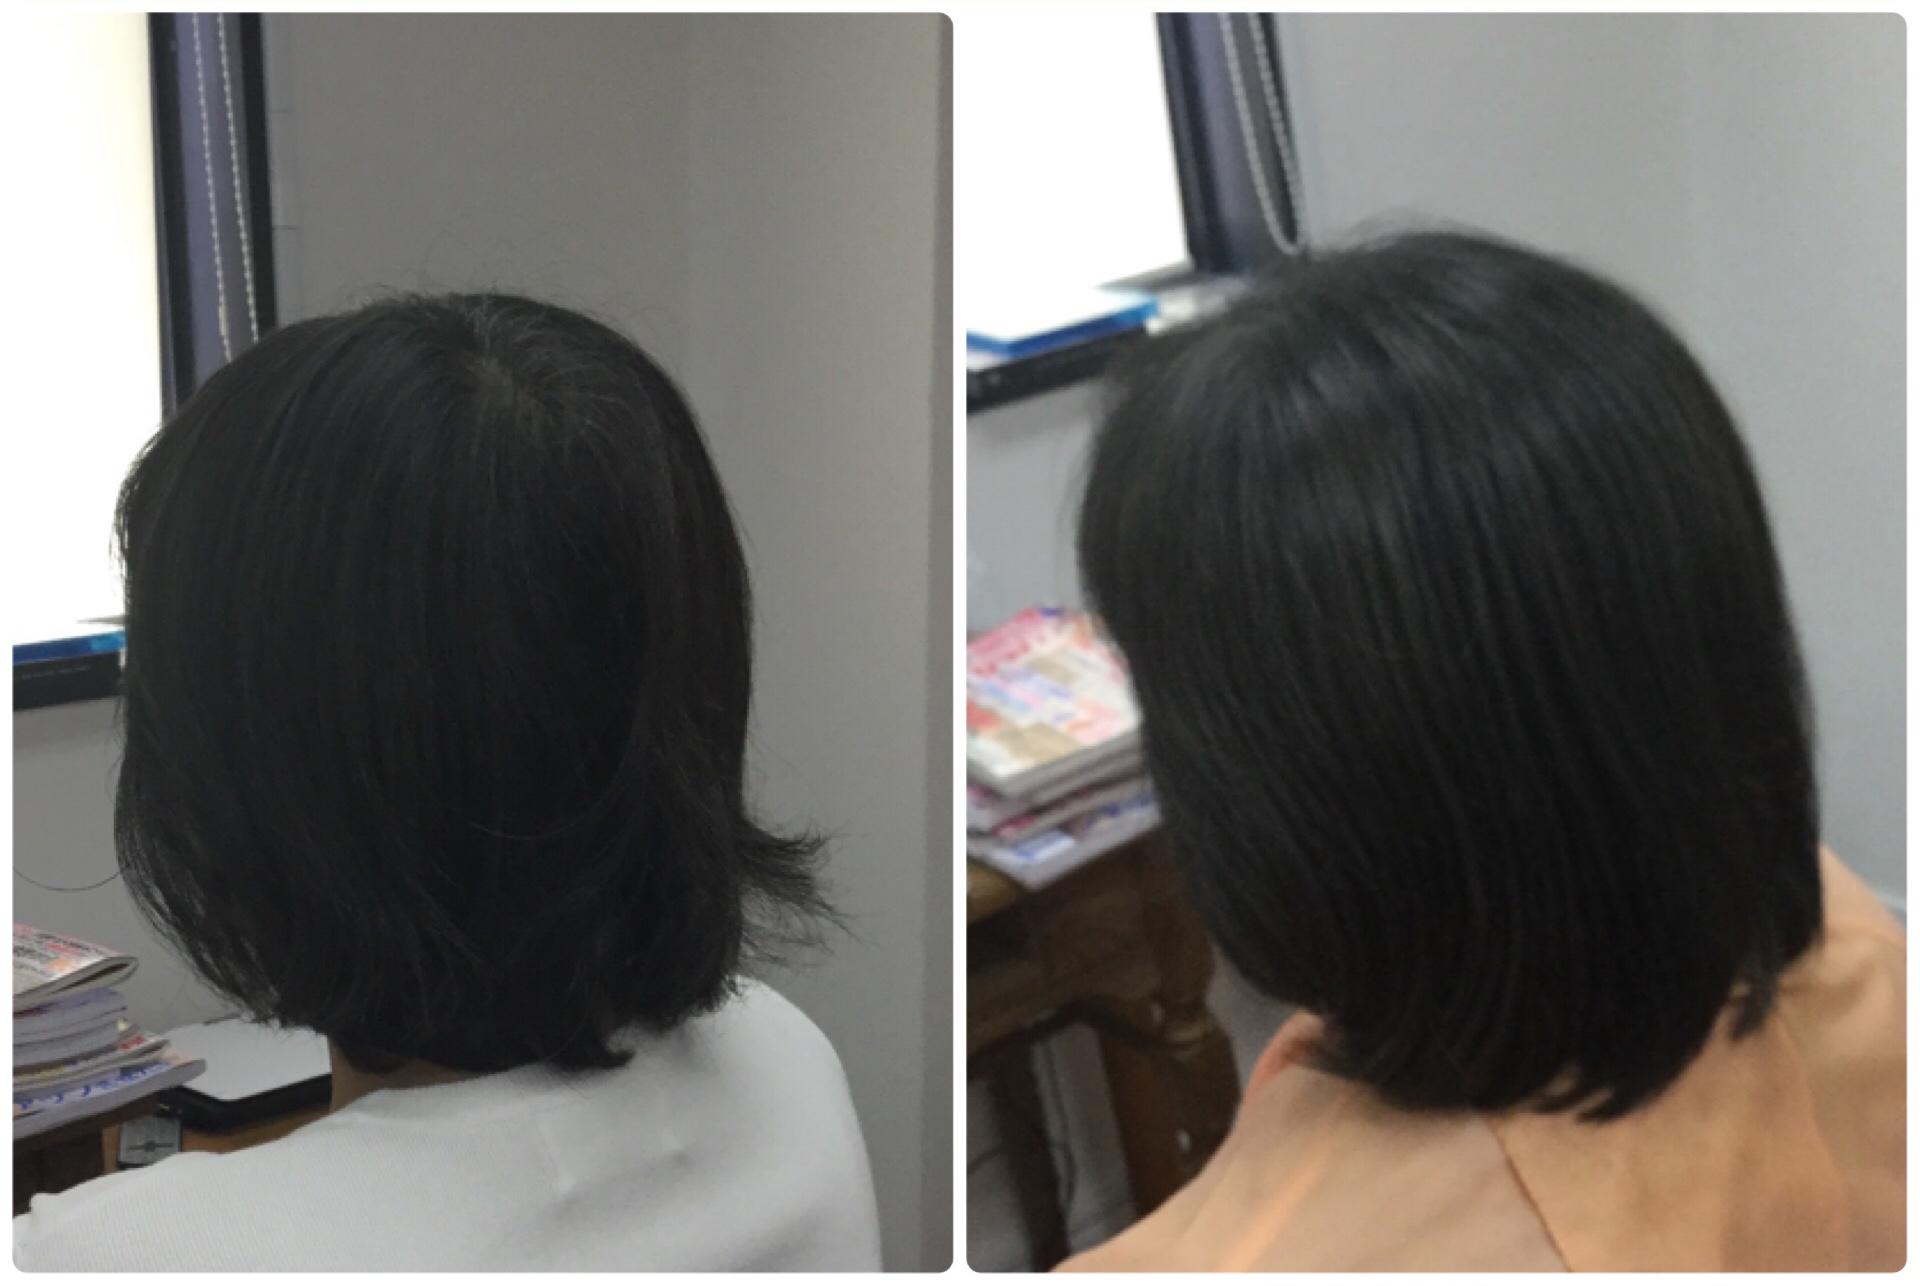 I40代から白髪染め加齢毛の悩みに【天然100%熟成HQヘナ】で華麗毛に!神戸くせ毛専門美容室アバディ